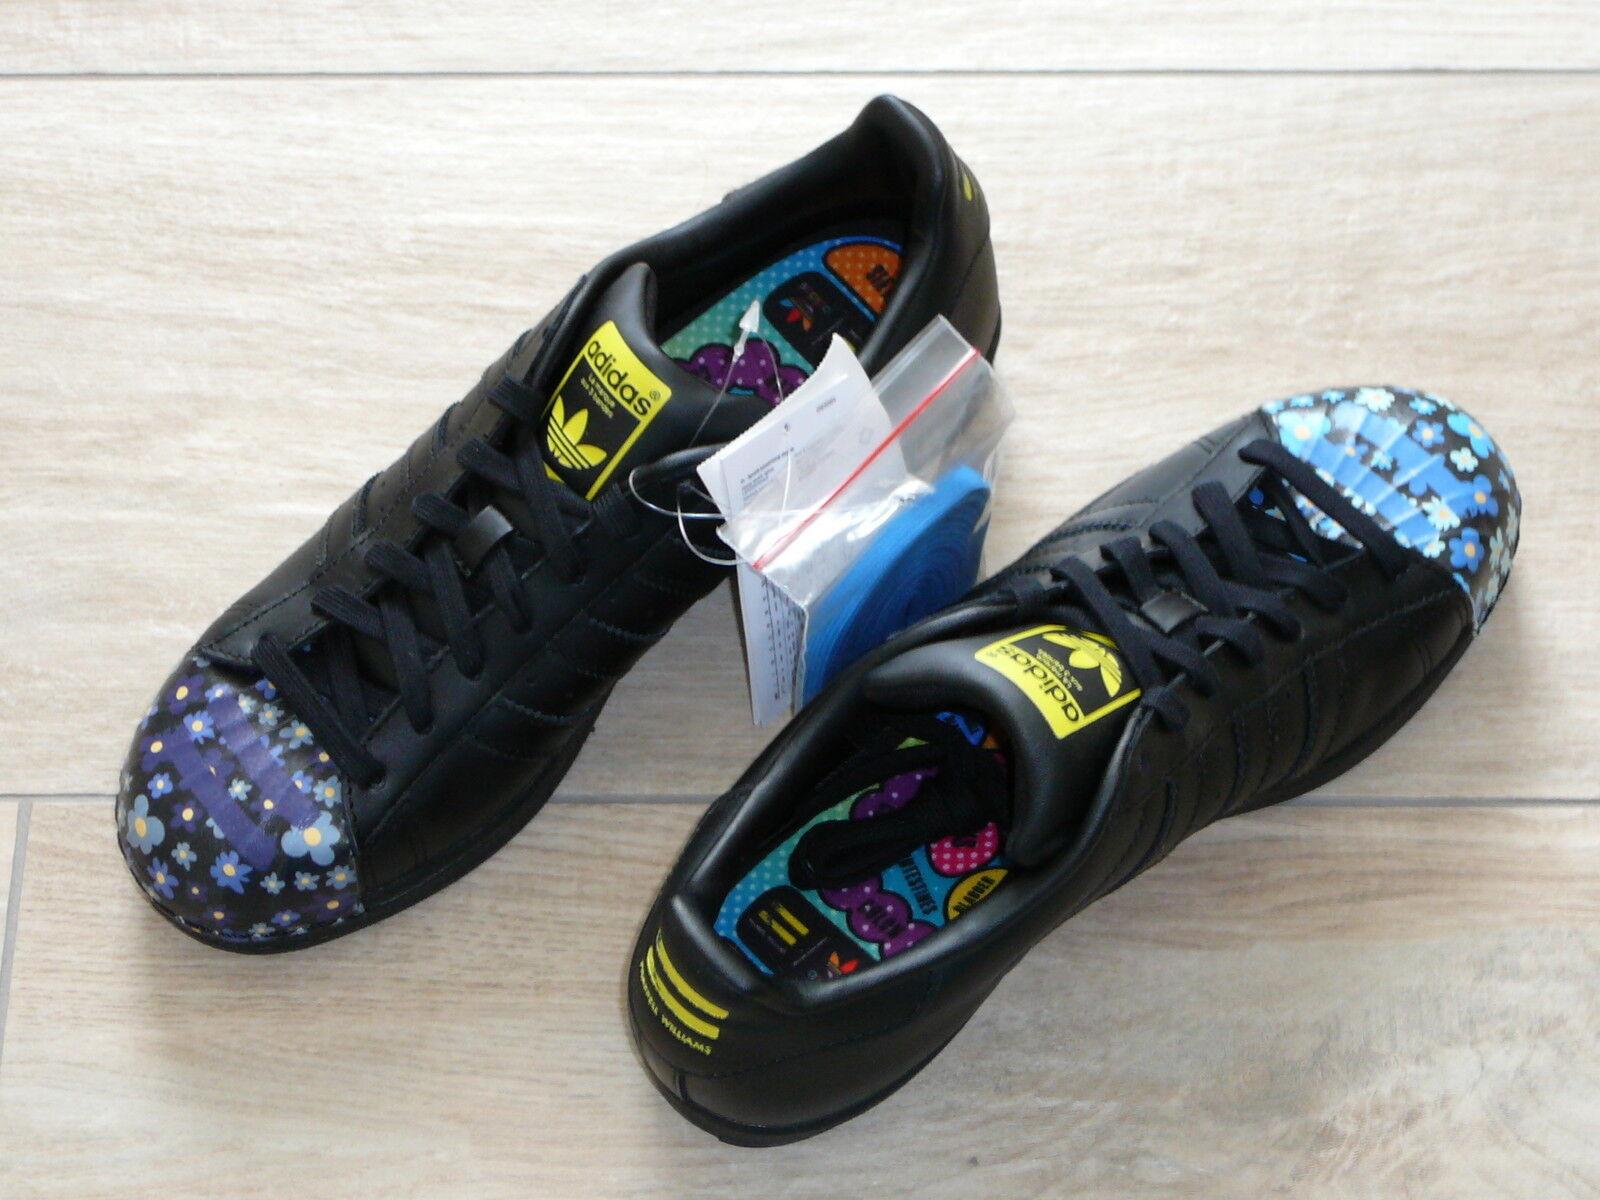 Adidas Superstar S83352 Originals Pharrell Williams Sneaker S83352 Superstar 0a5db1